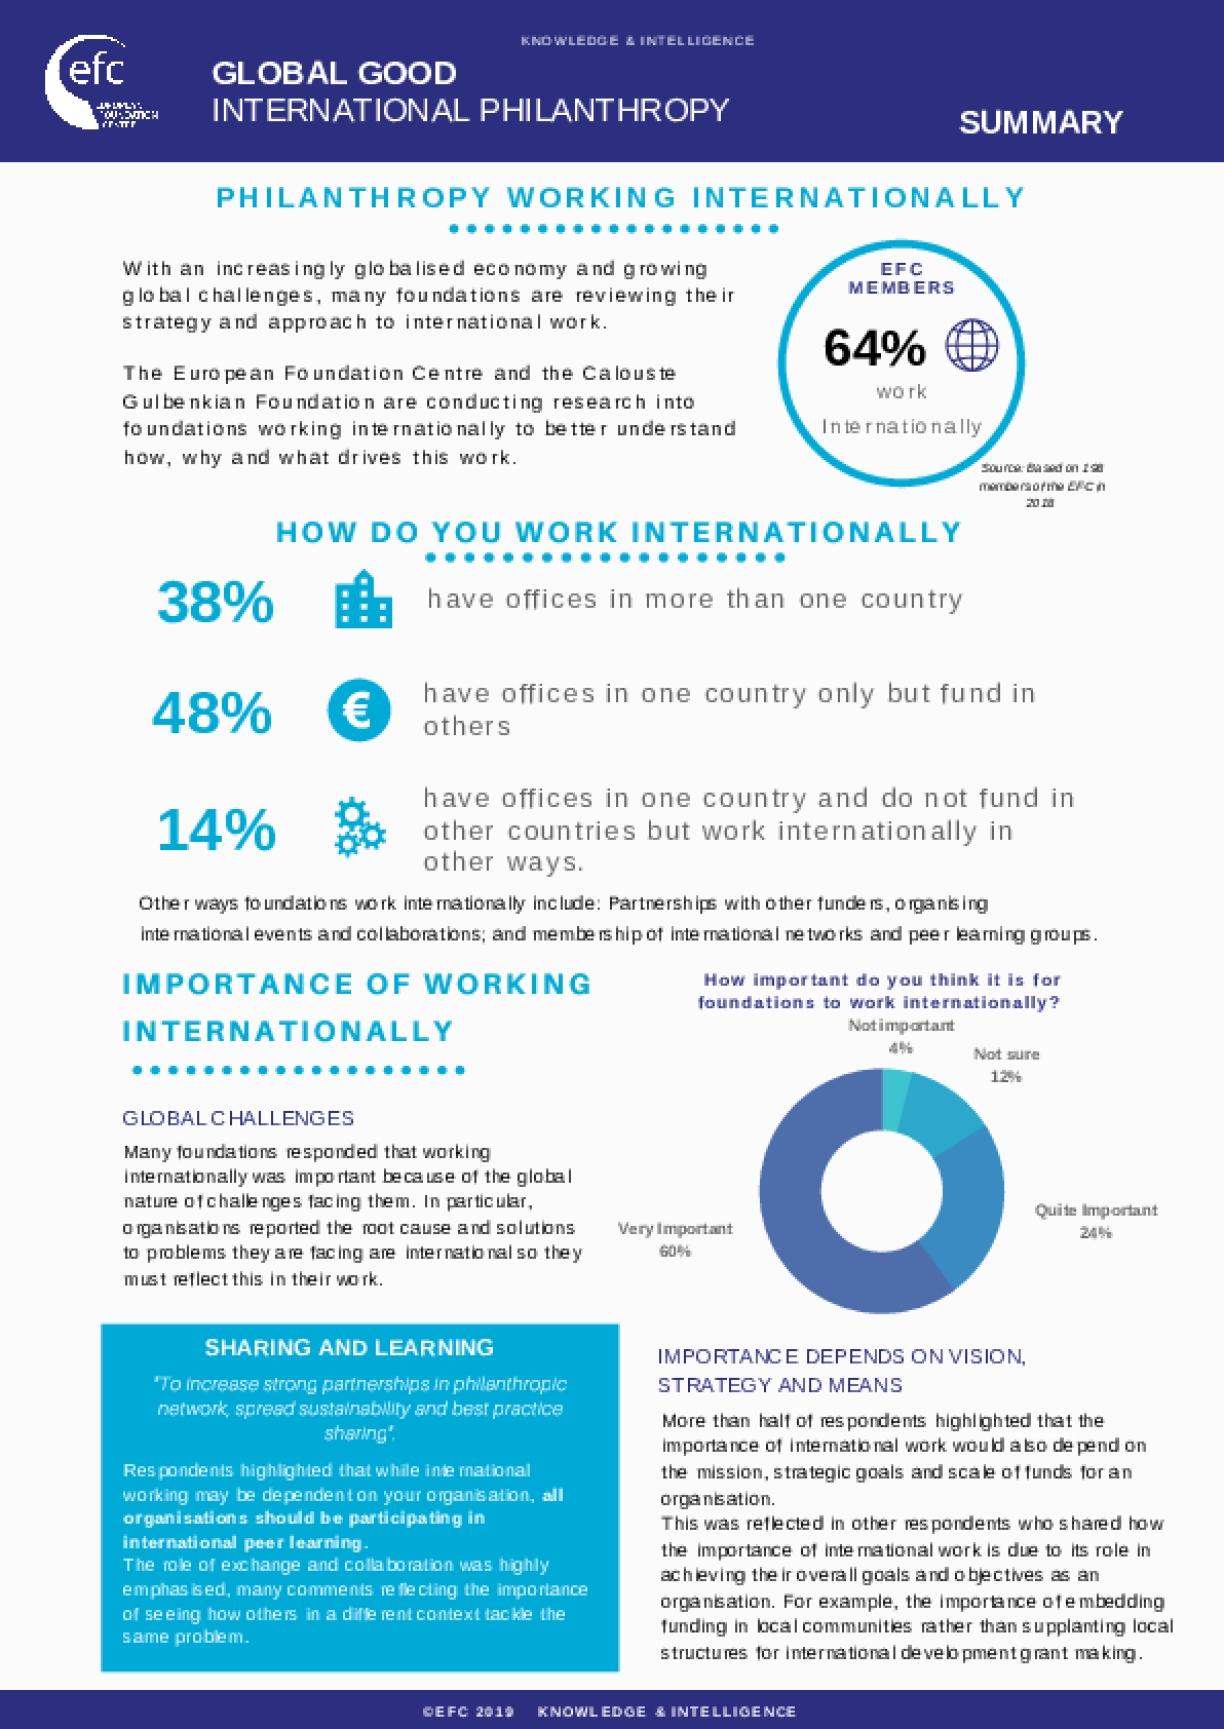 Key Facts about European Philanthropy Working Internationally